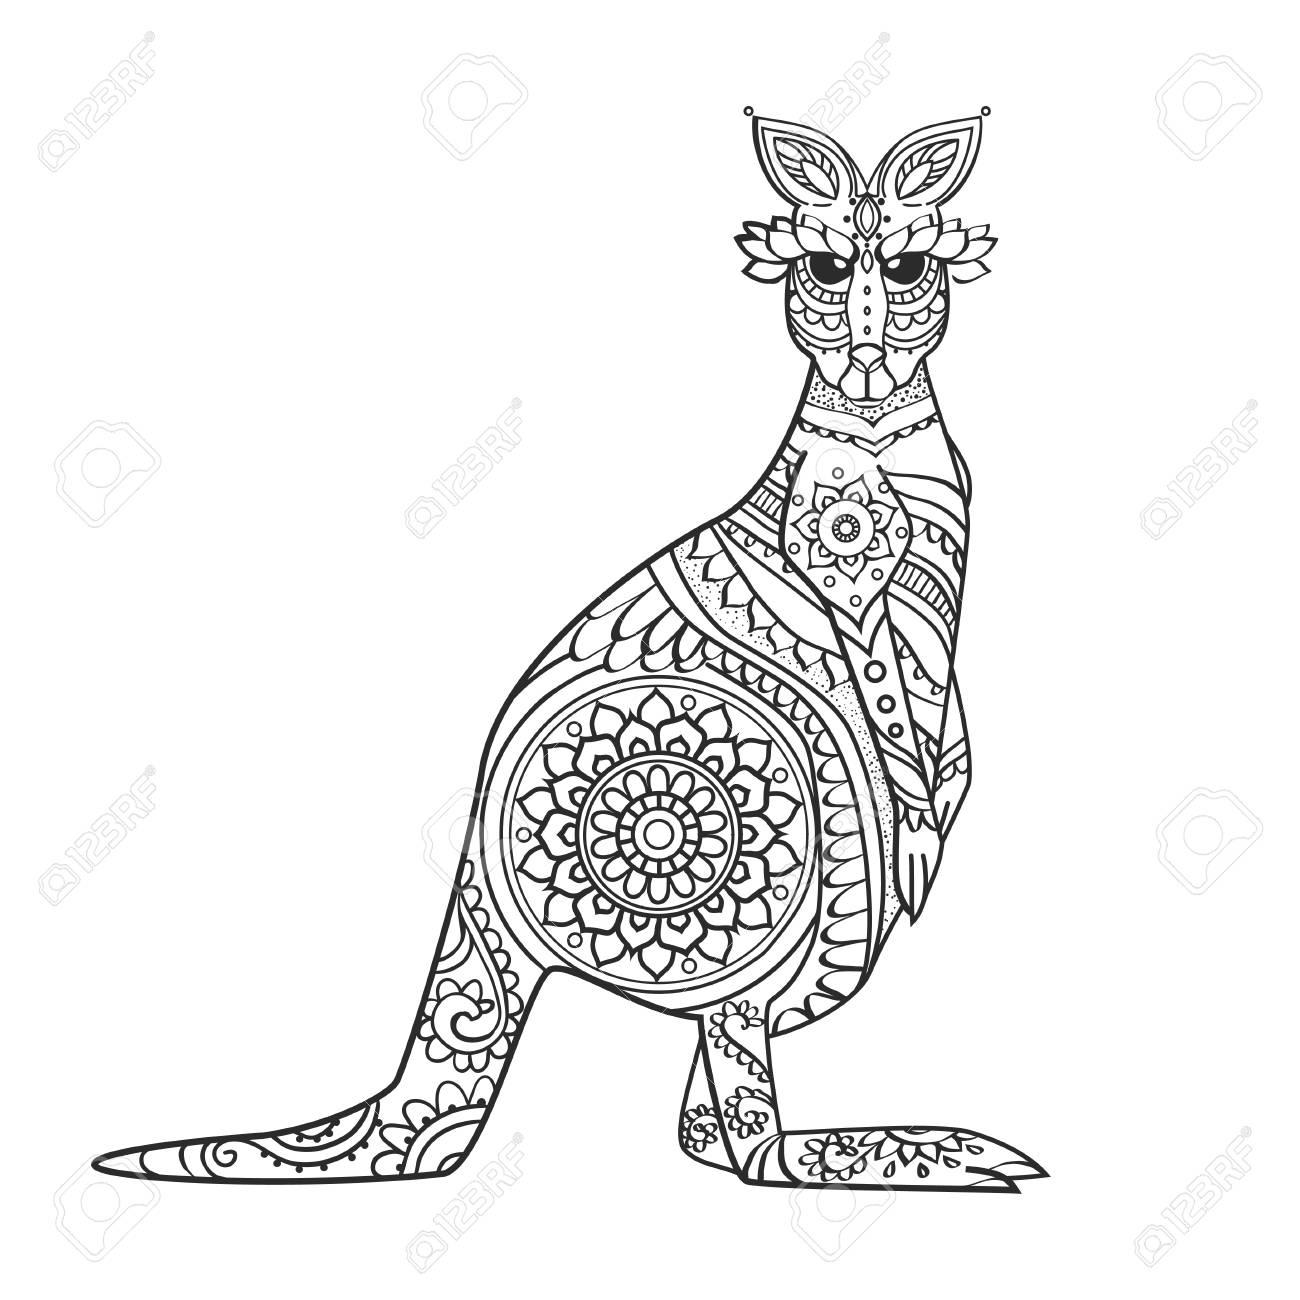 Coloriage Mandala Kangourou.Vecteur Kangourou Ornement Belle Illustration Kangourou Pour La